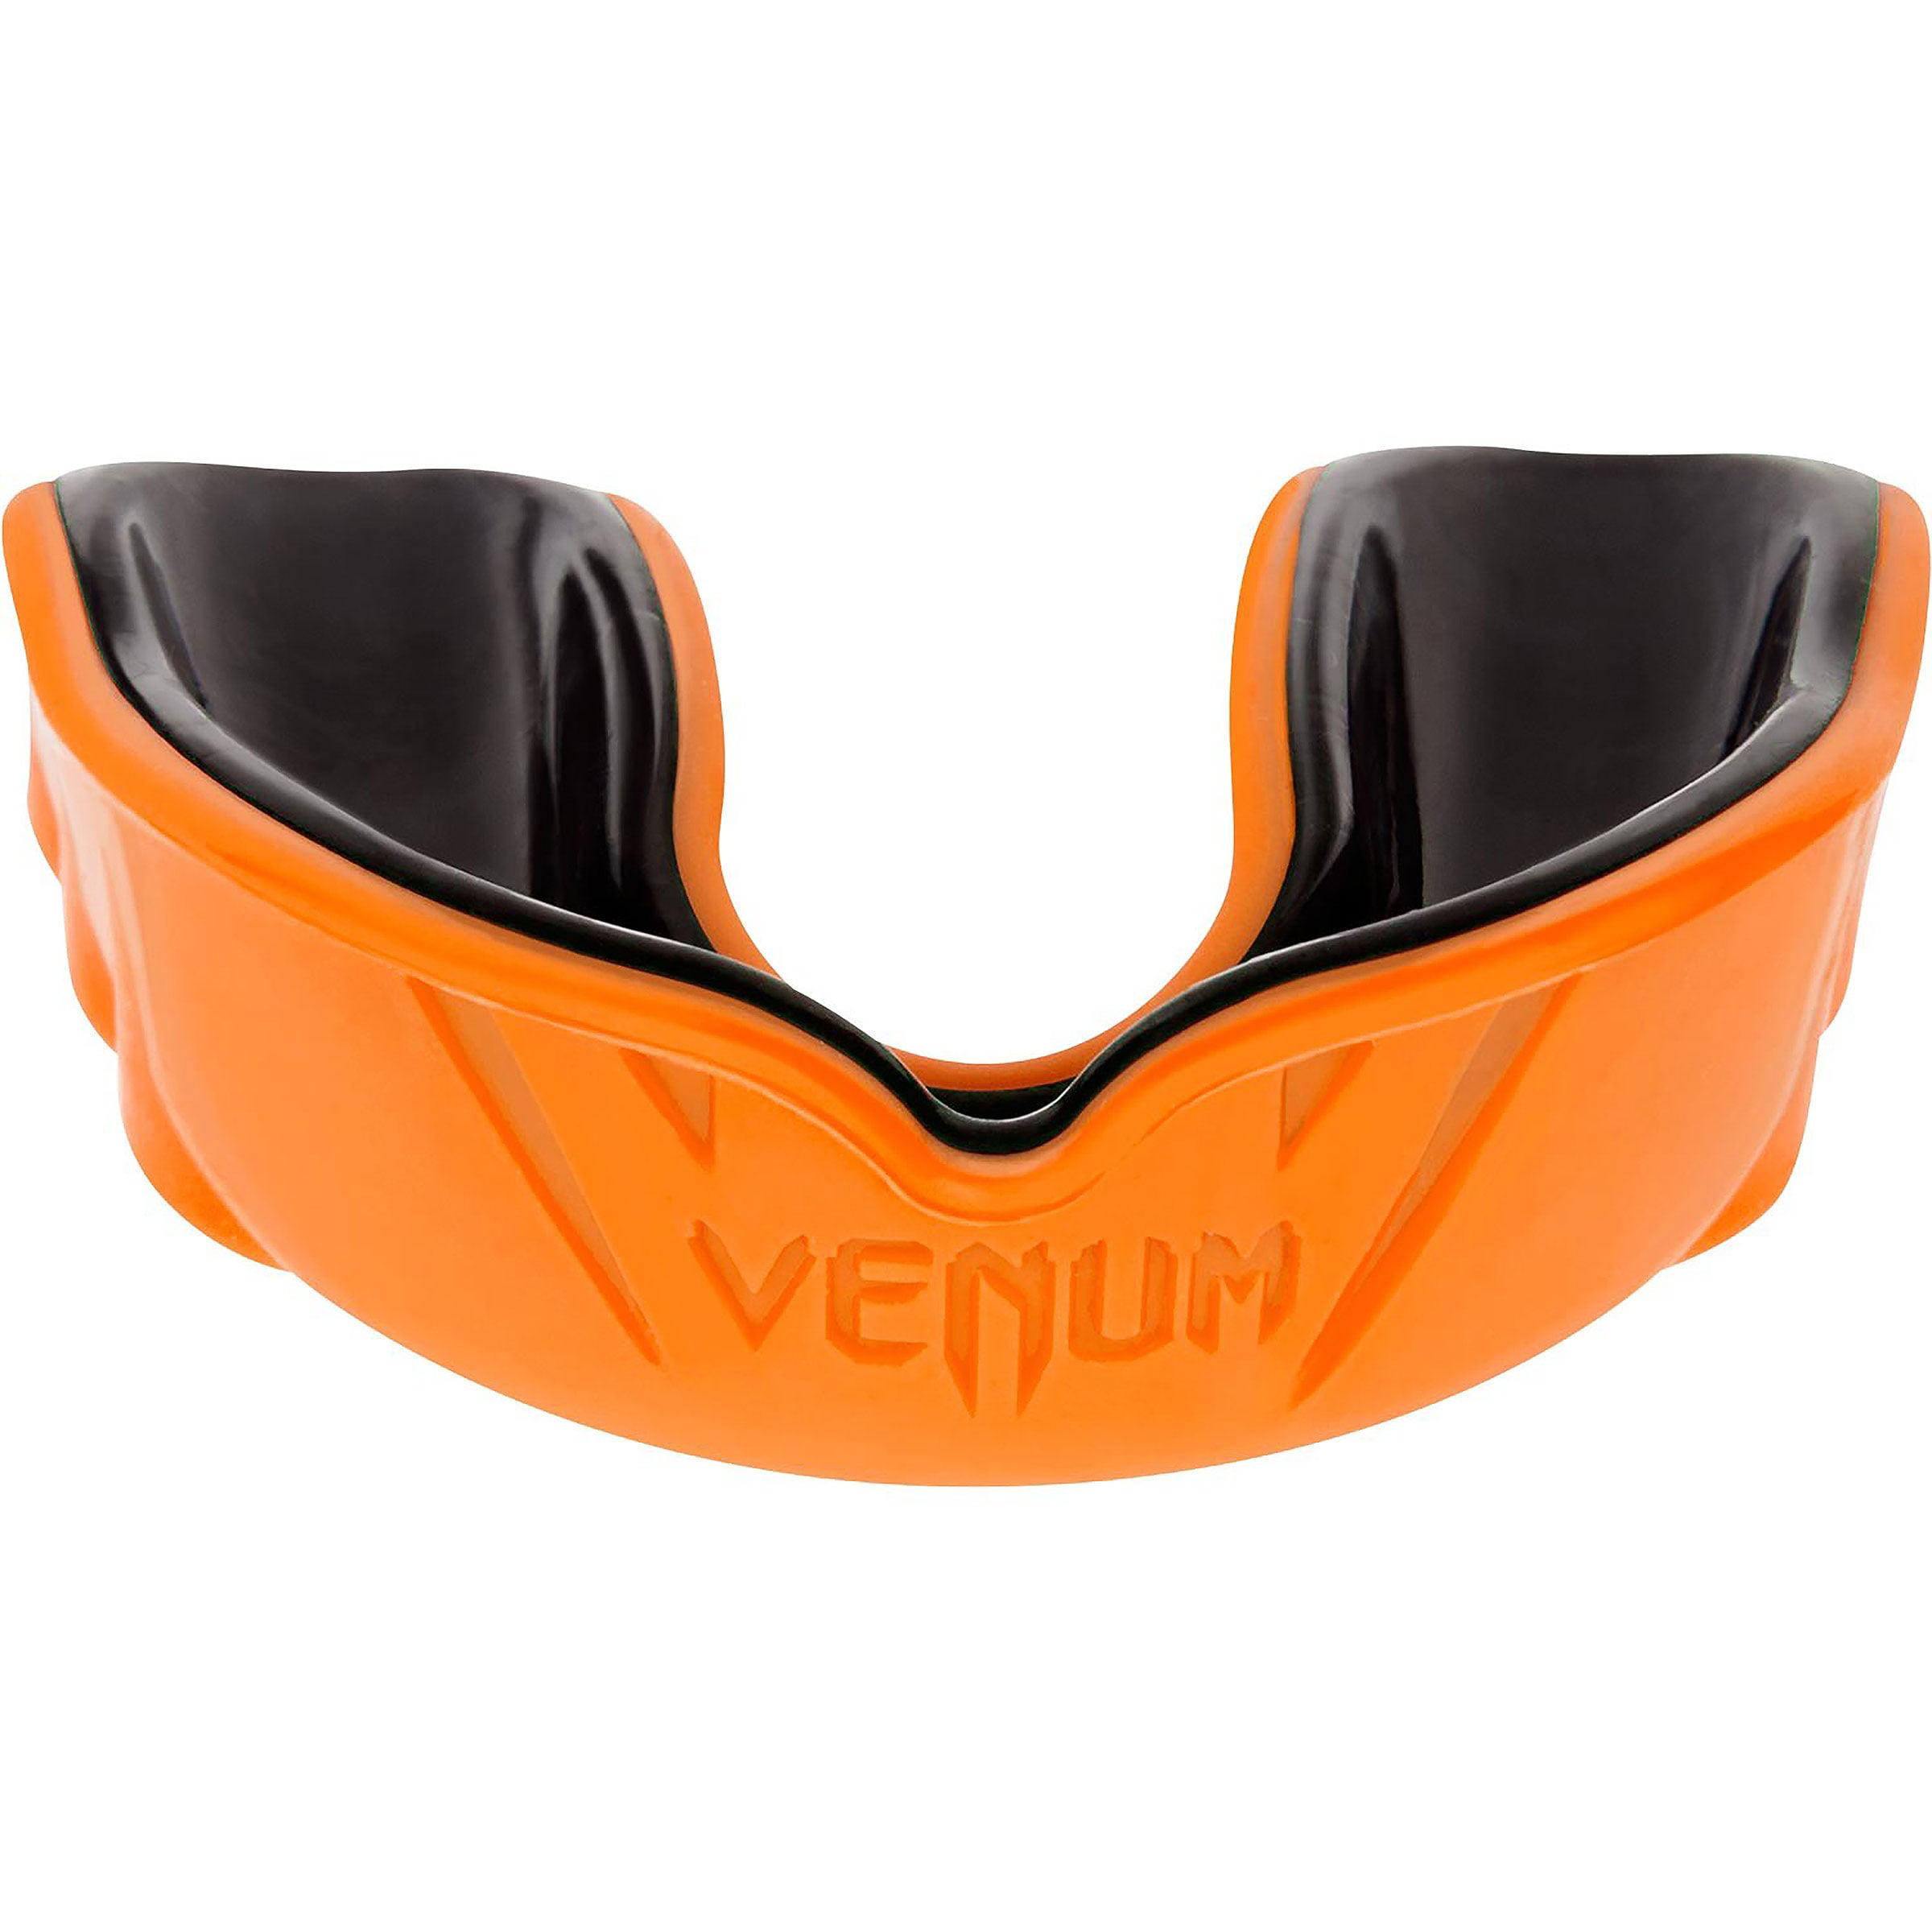 Venum Challenger Mouthguard